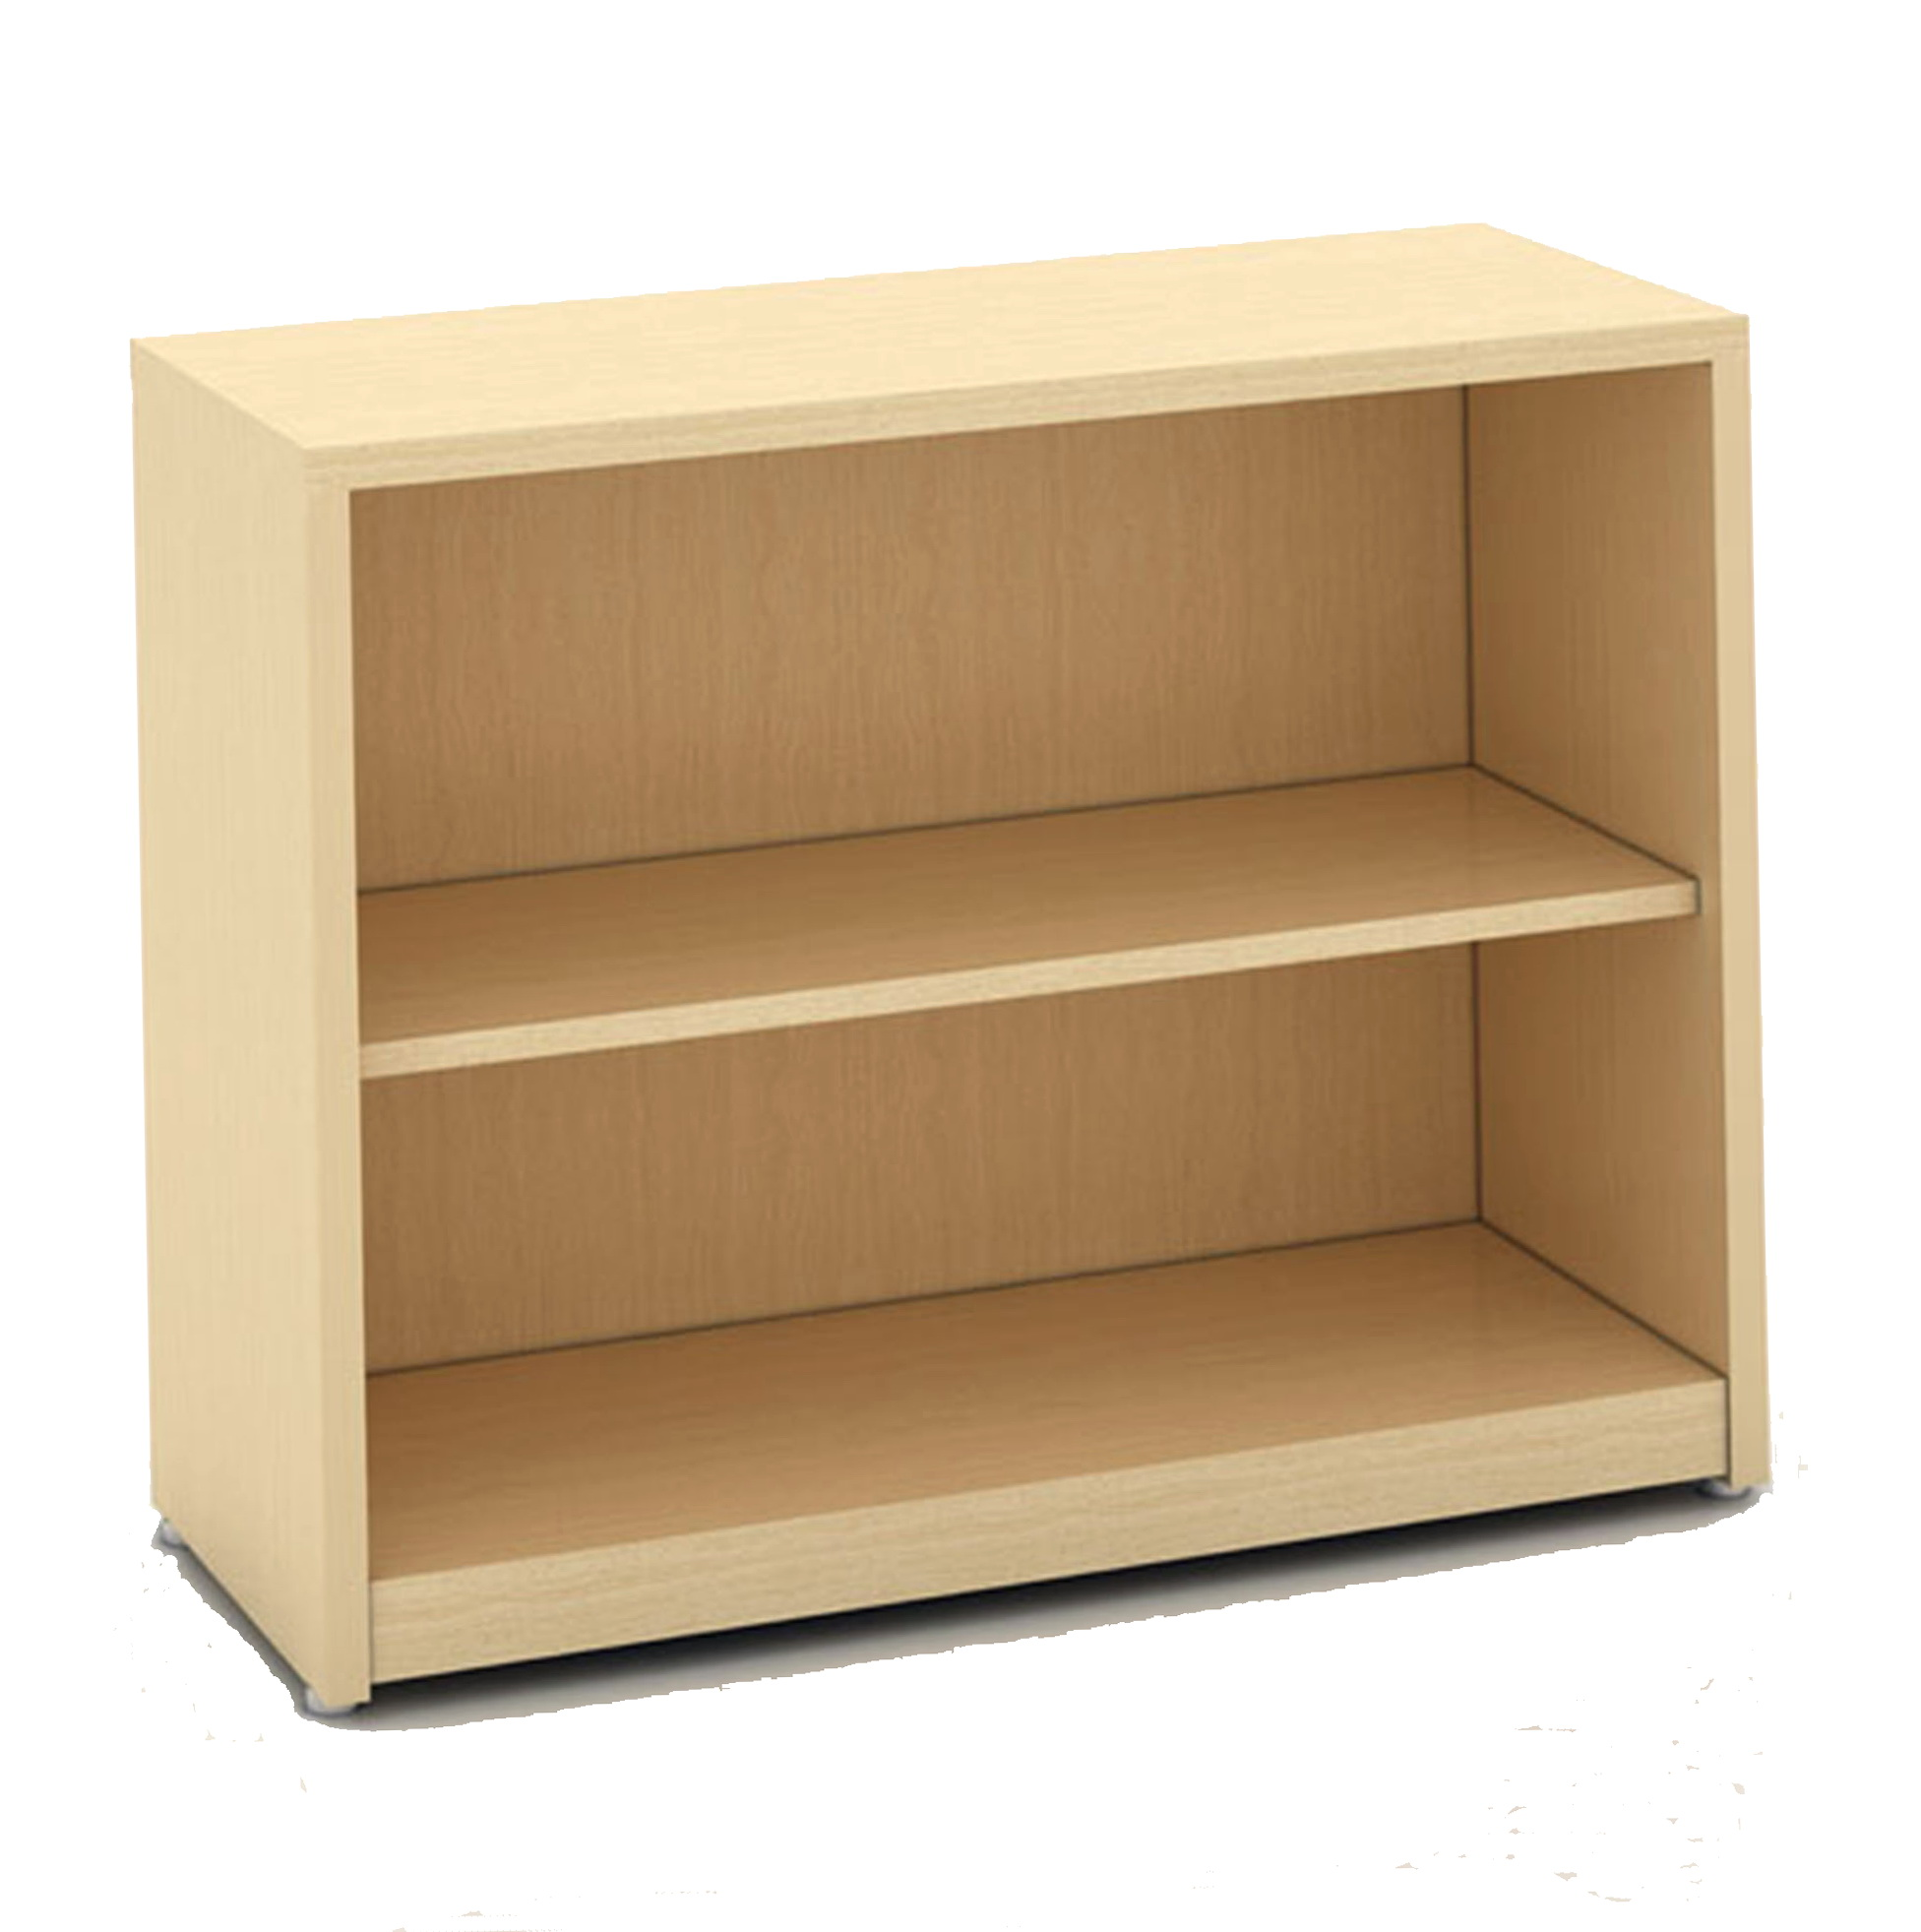 2 Shelf Bookcase Maple